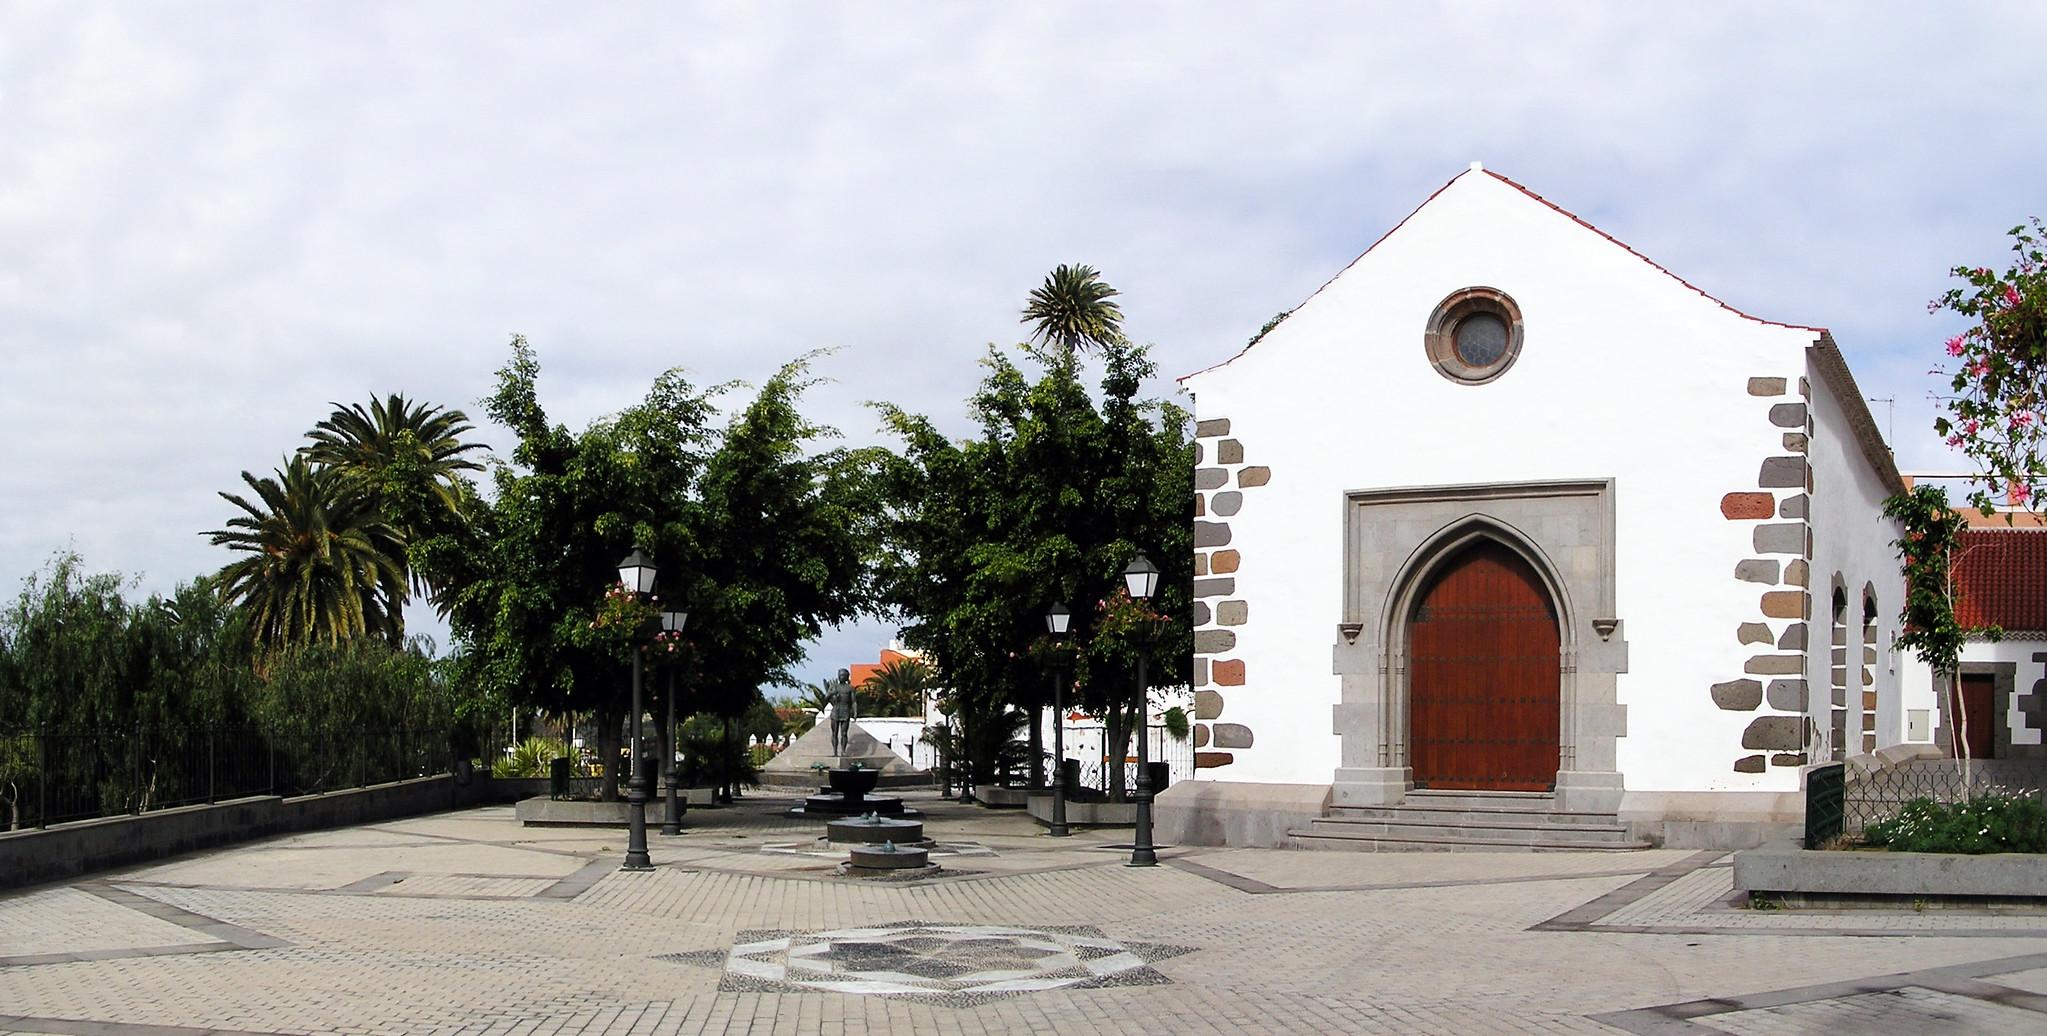 Iglesia Hospitalaria de San Pedro Martir de Verona centro de exposicion de Historia de Telde isla de Gran Canaria